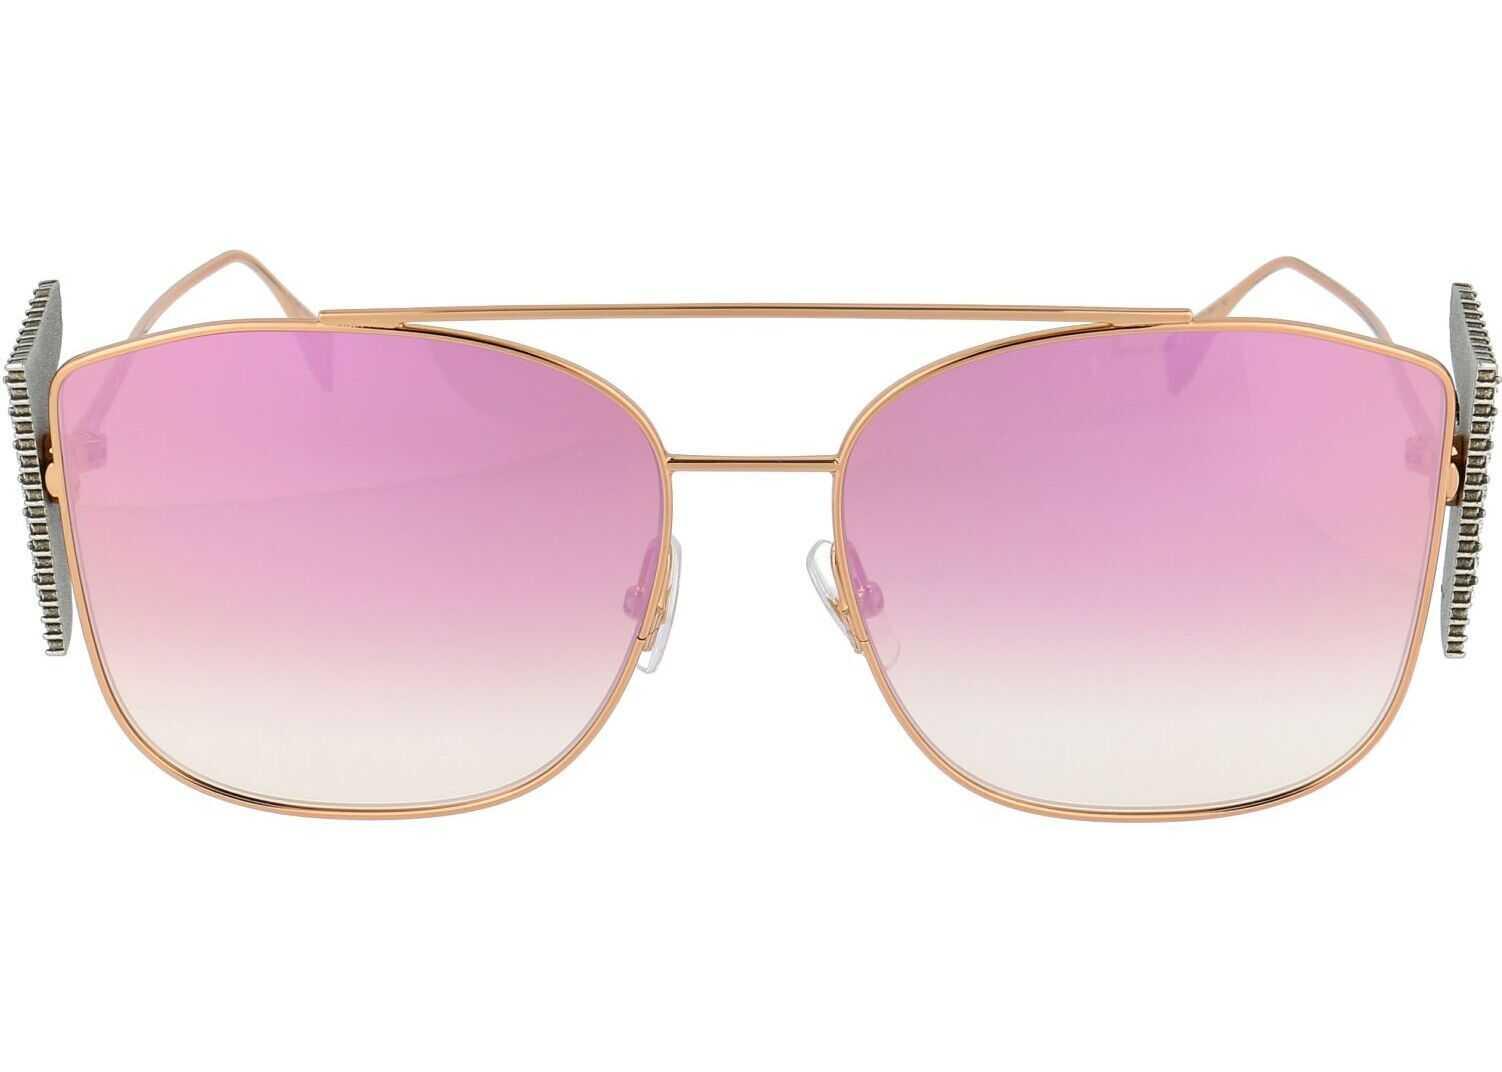 Fendi Metal Sunglasses GOLD